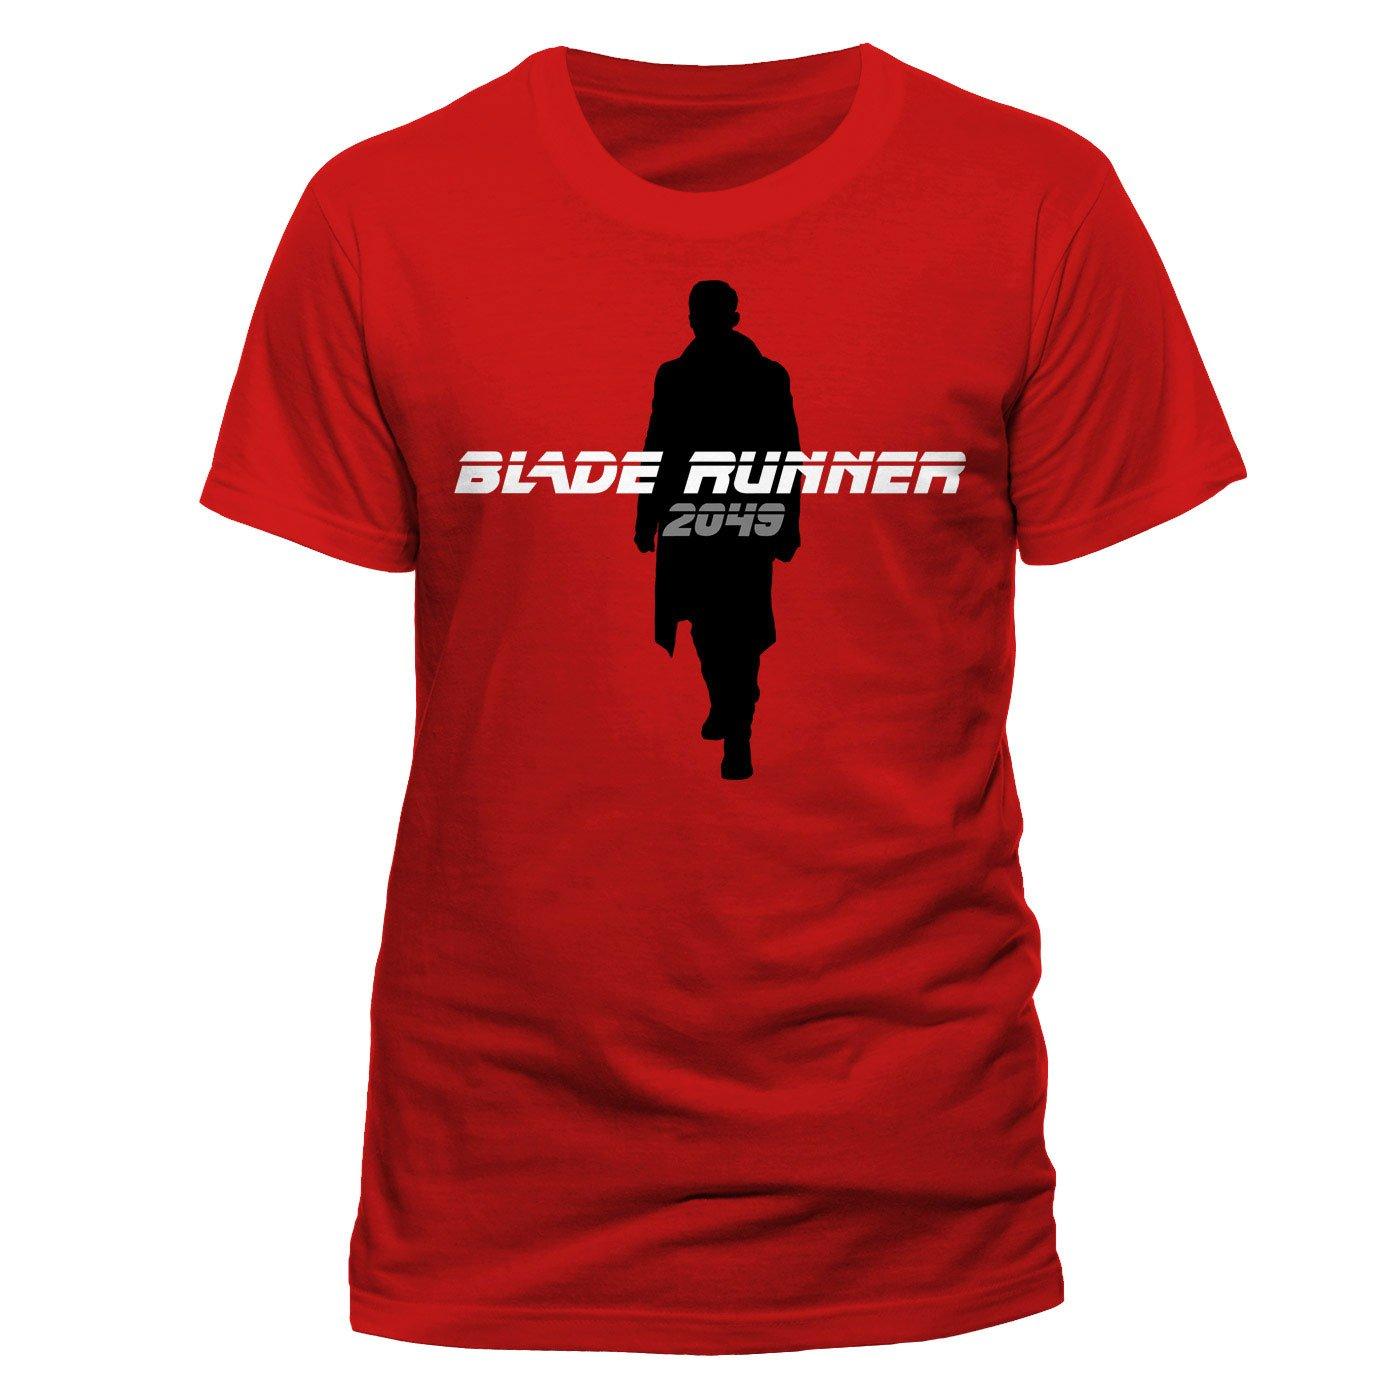 Blade Runner 2049 T-Shirt Silhouette Size M